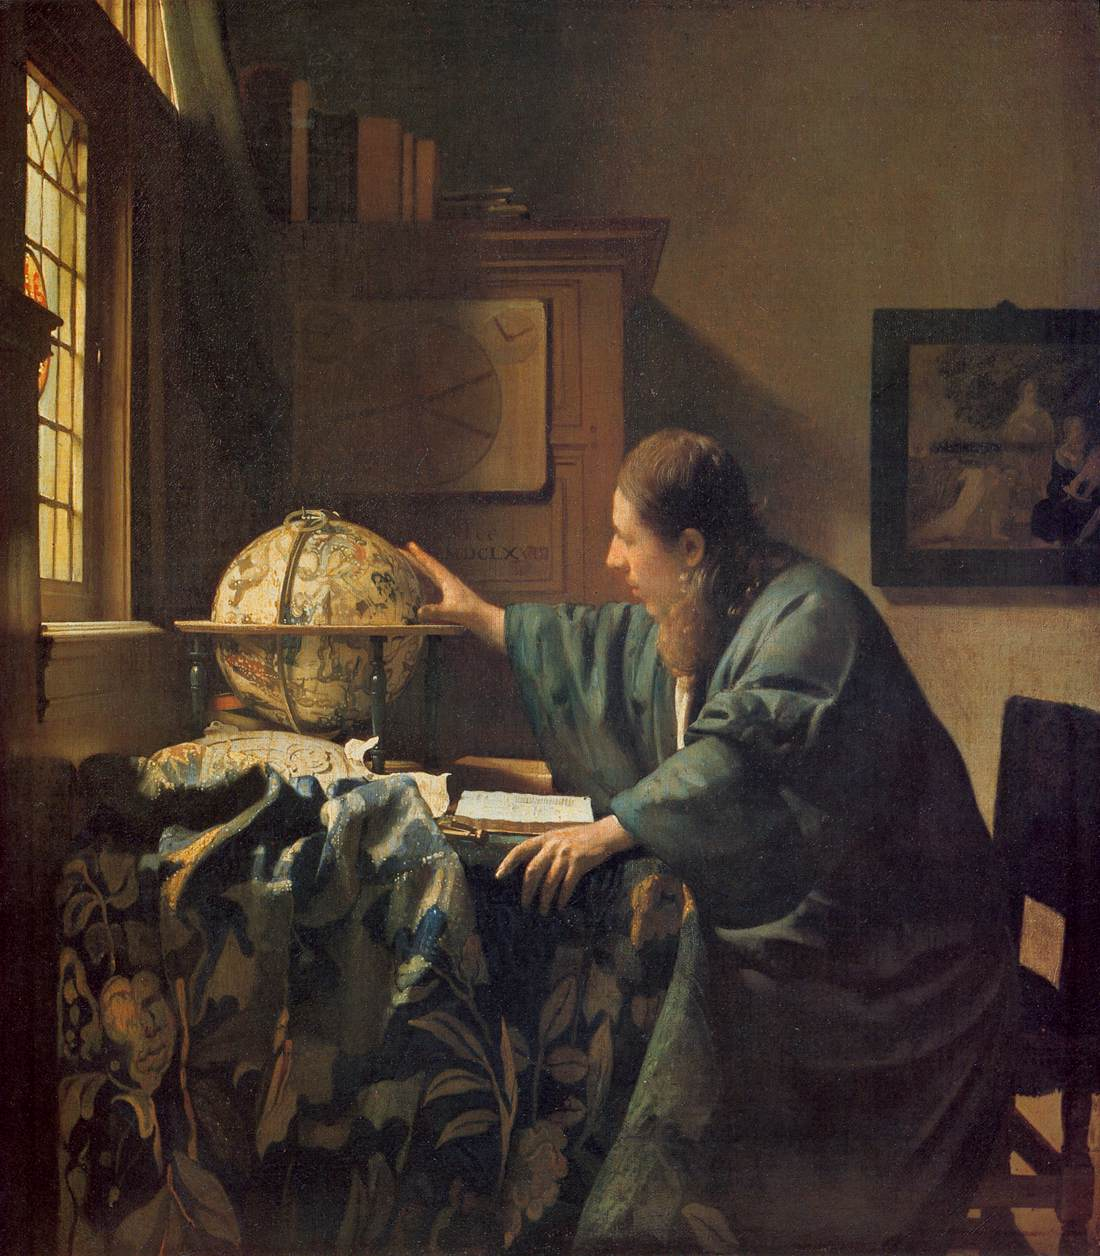 vermeer_the_astronomer.jpg